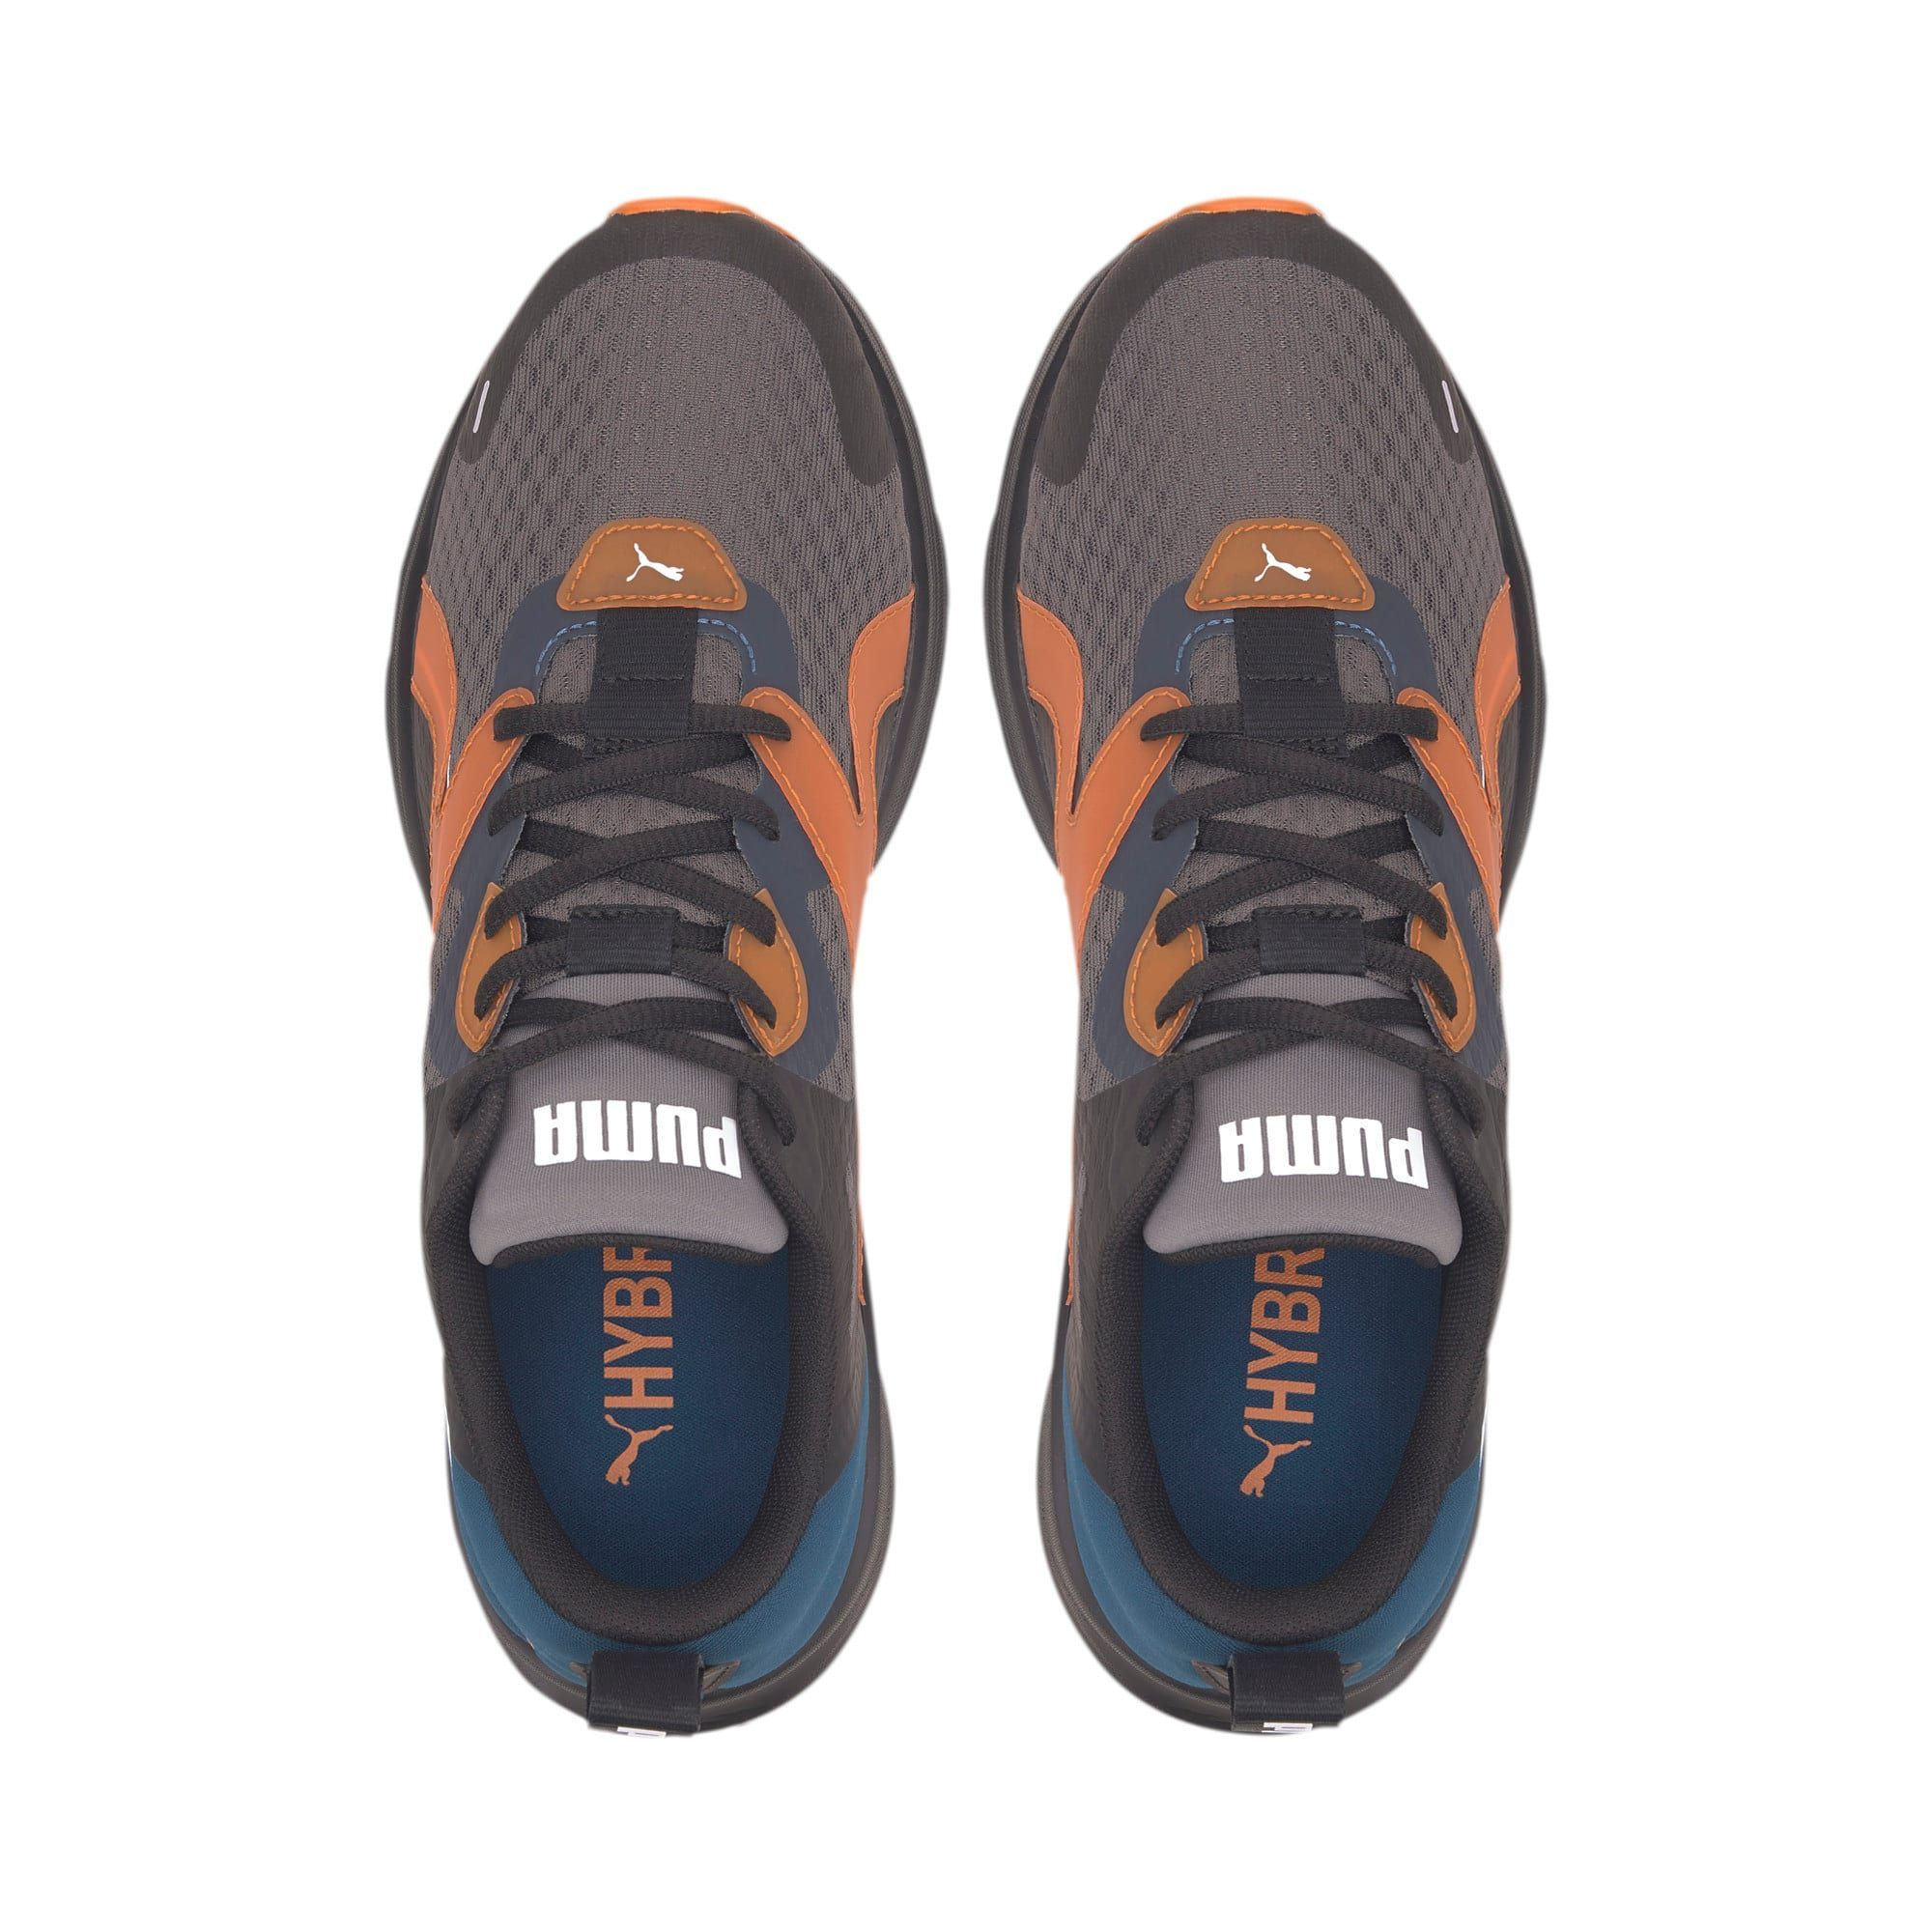 PUMA Hybrid Fuego Men's Running Shoes